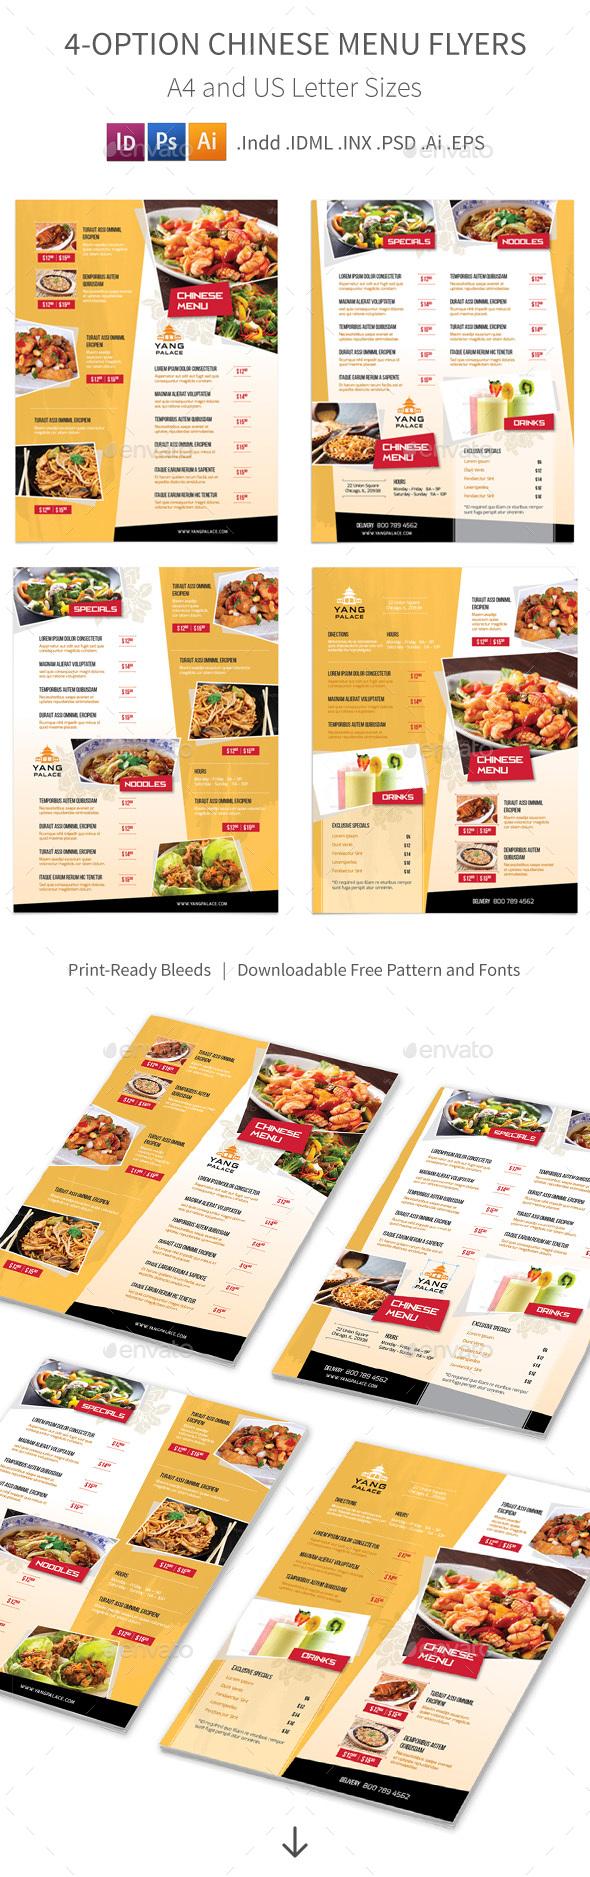 Chinese Restaurant Menu Flyers – 4 Options